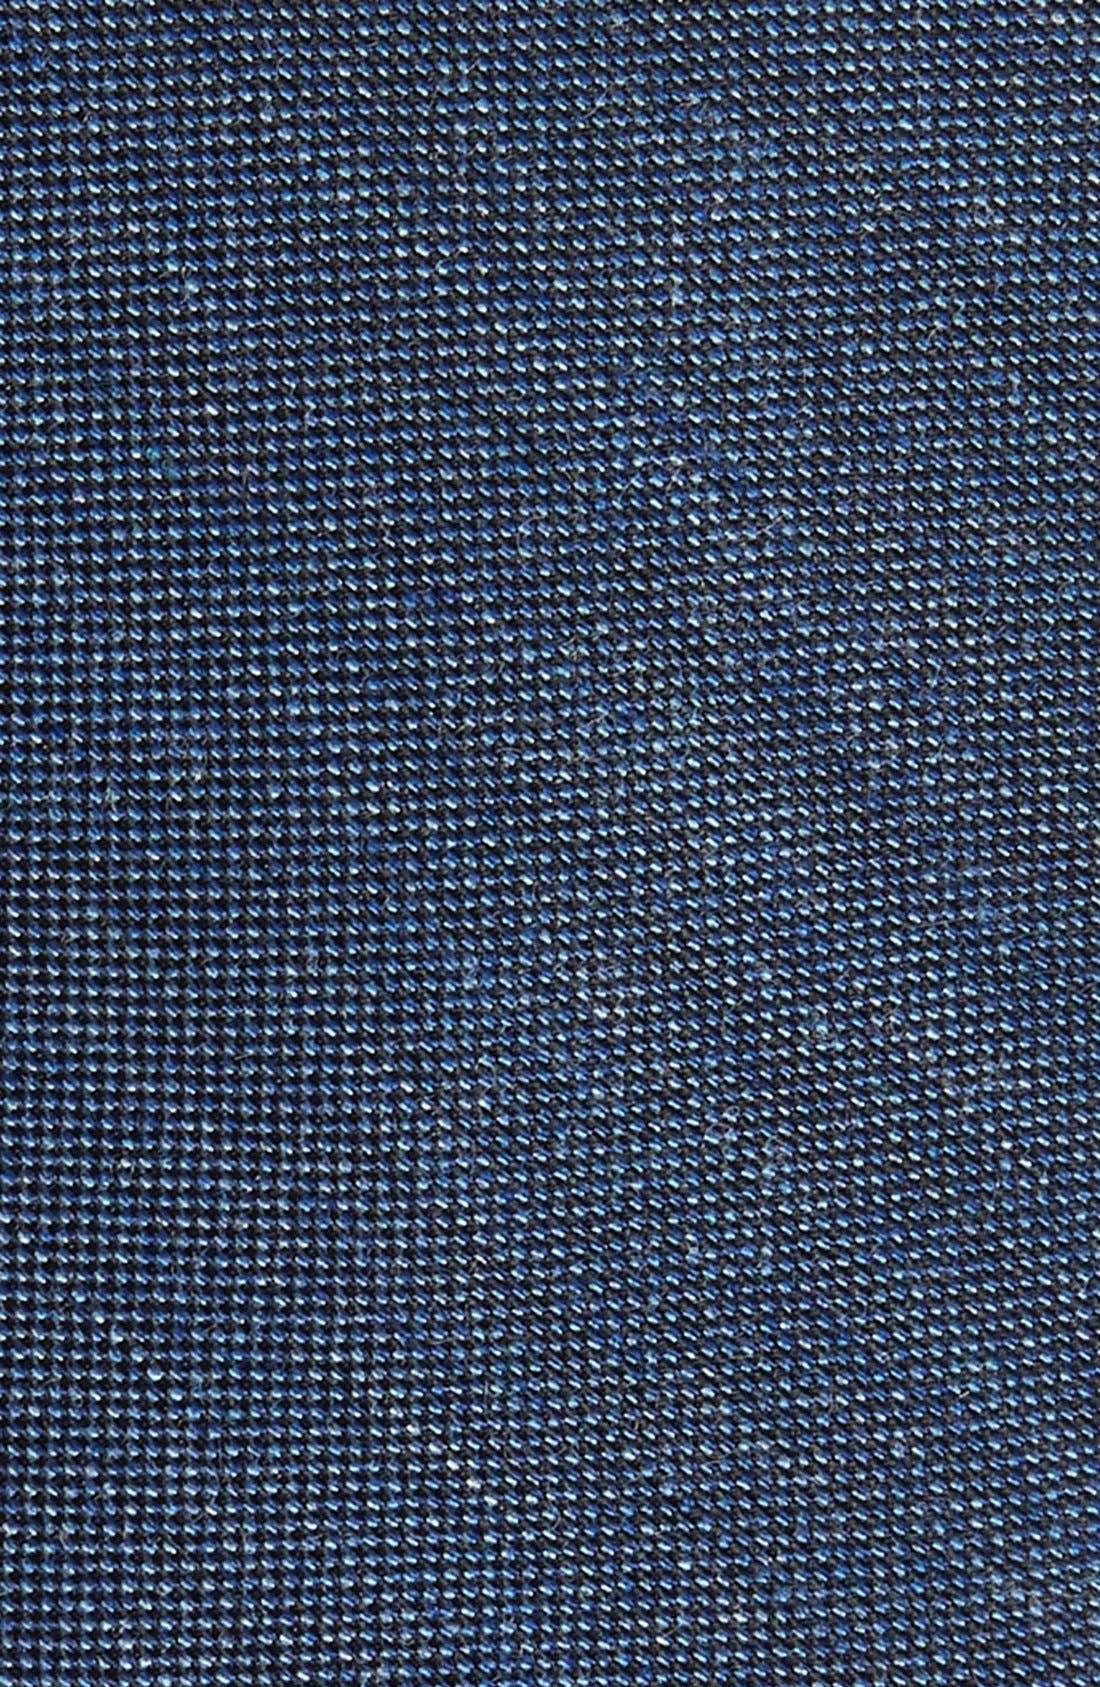 Mélange Woven Skinny Tie,                             Alternate thumbnail 2, color,                             Blue